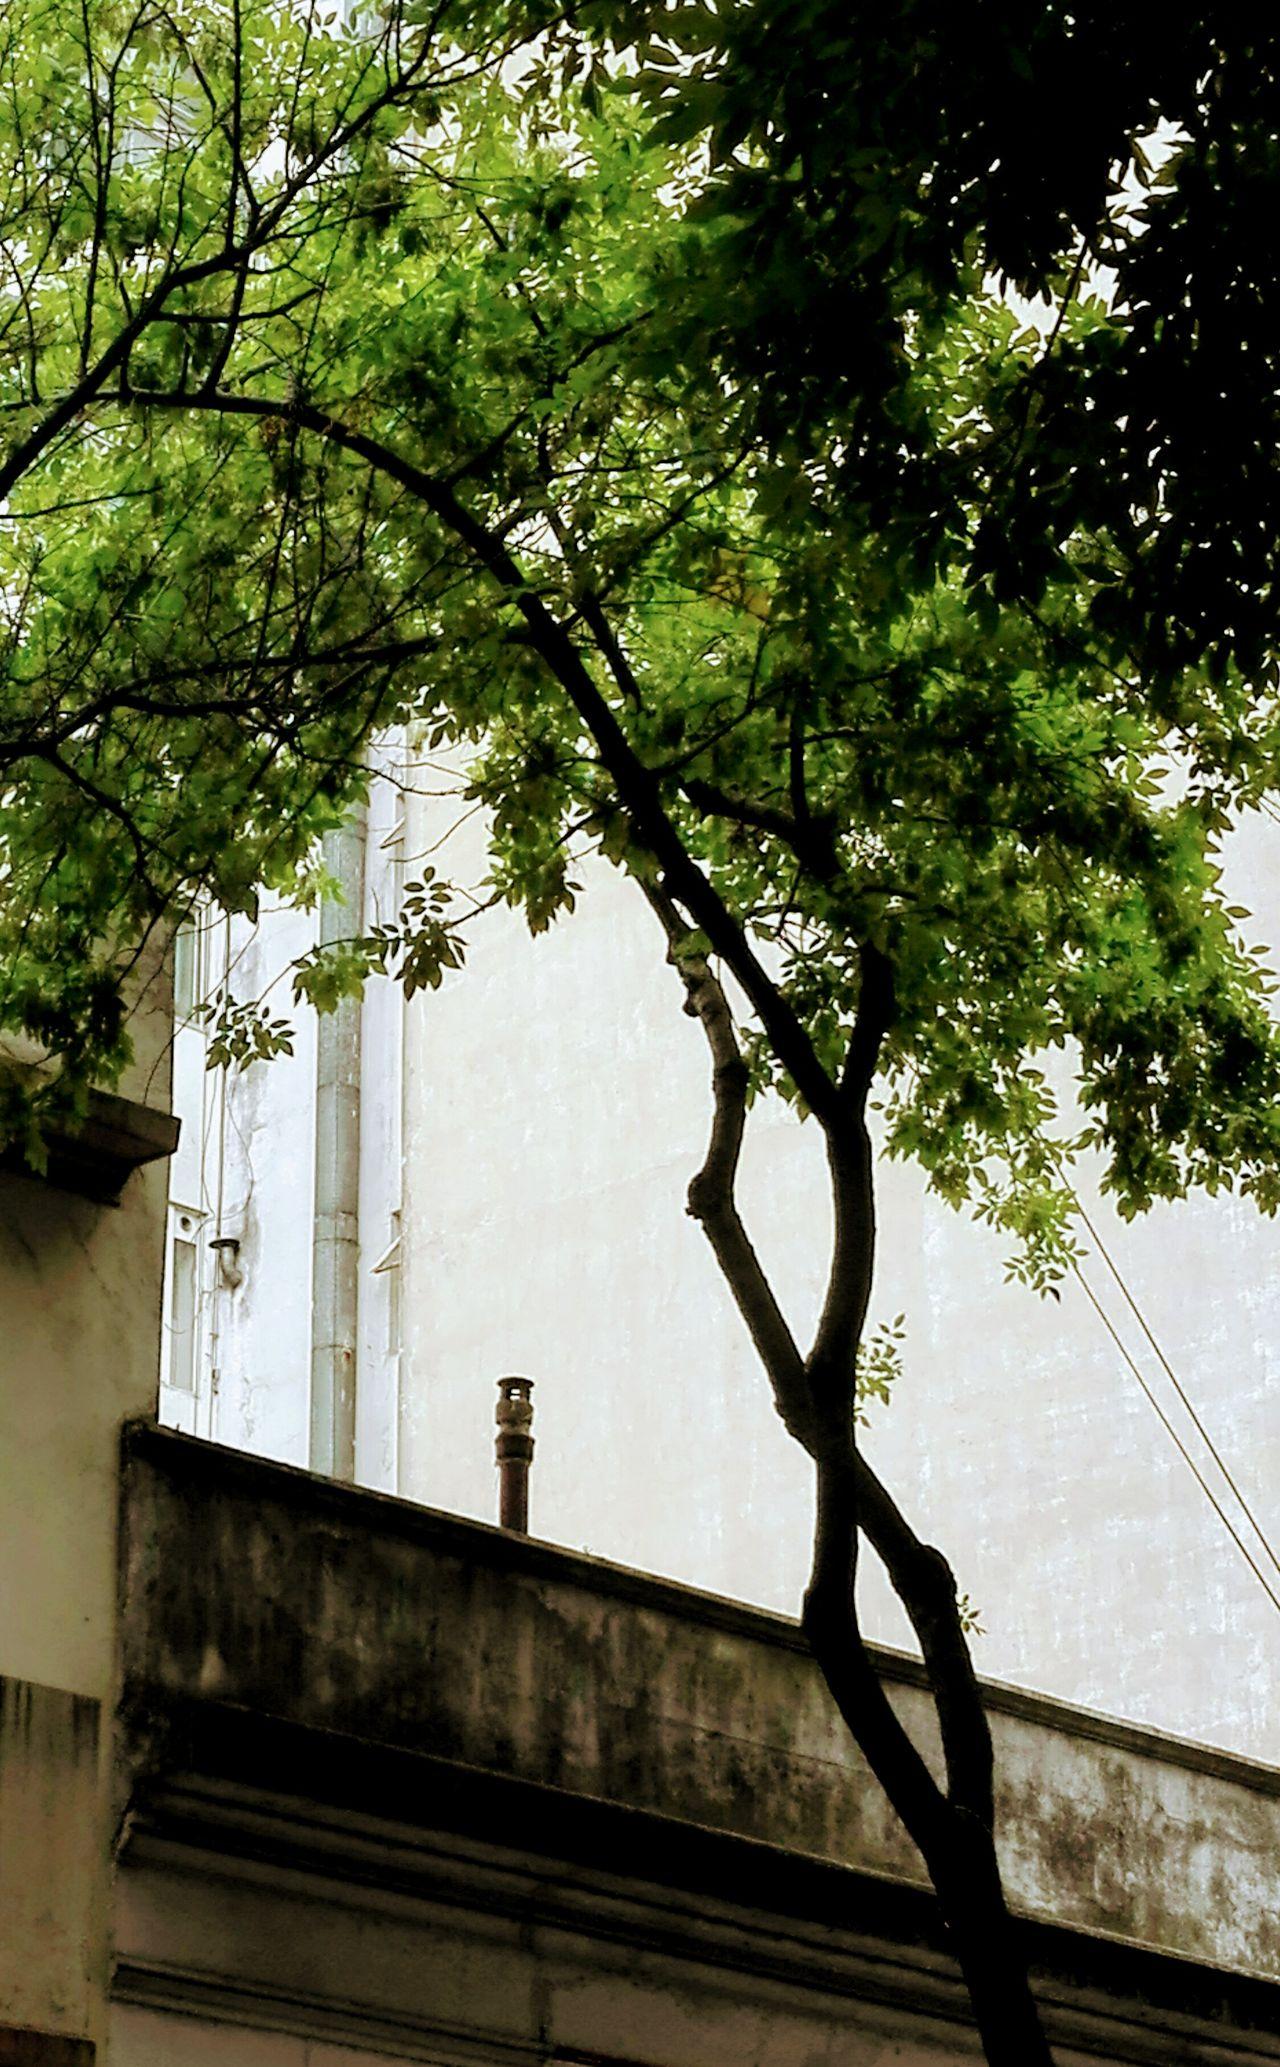 Urban Exploration Cityexplorer City Tree No People Built Structure Nature Outdoors Architecture Day Sky